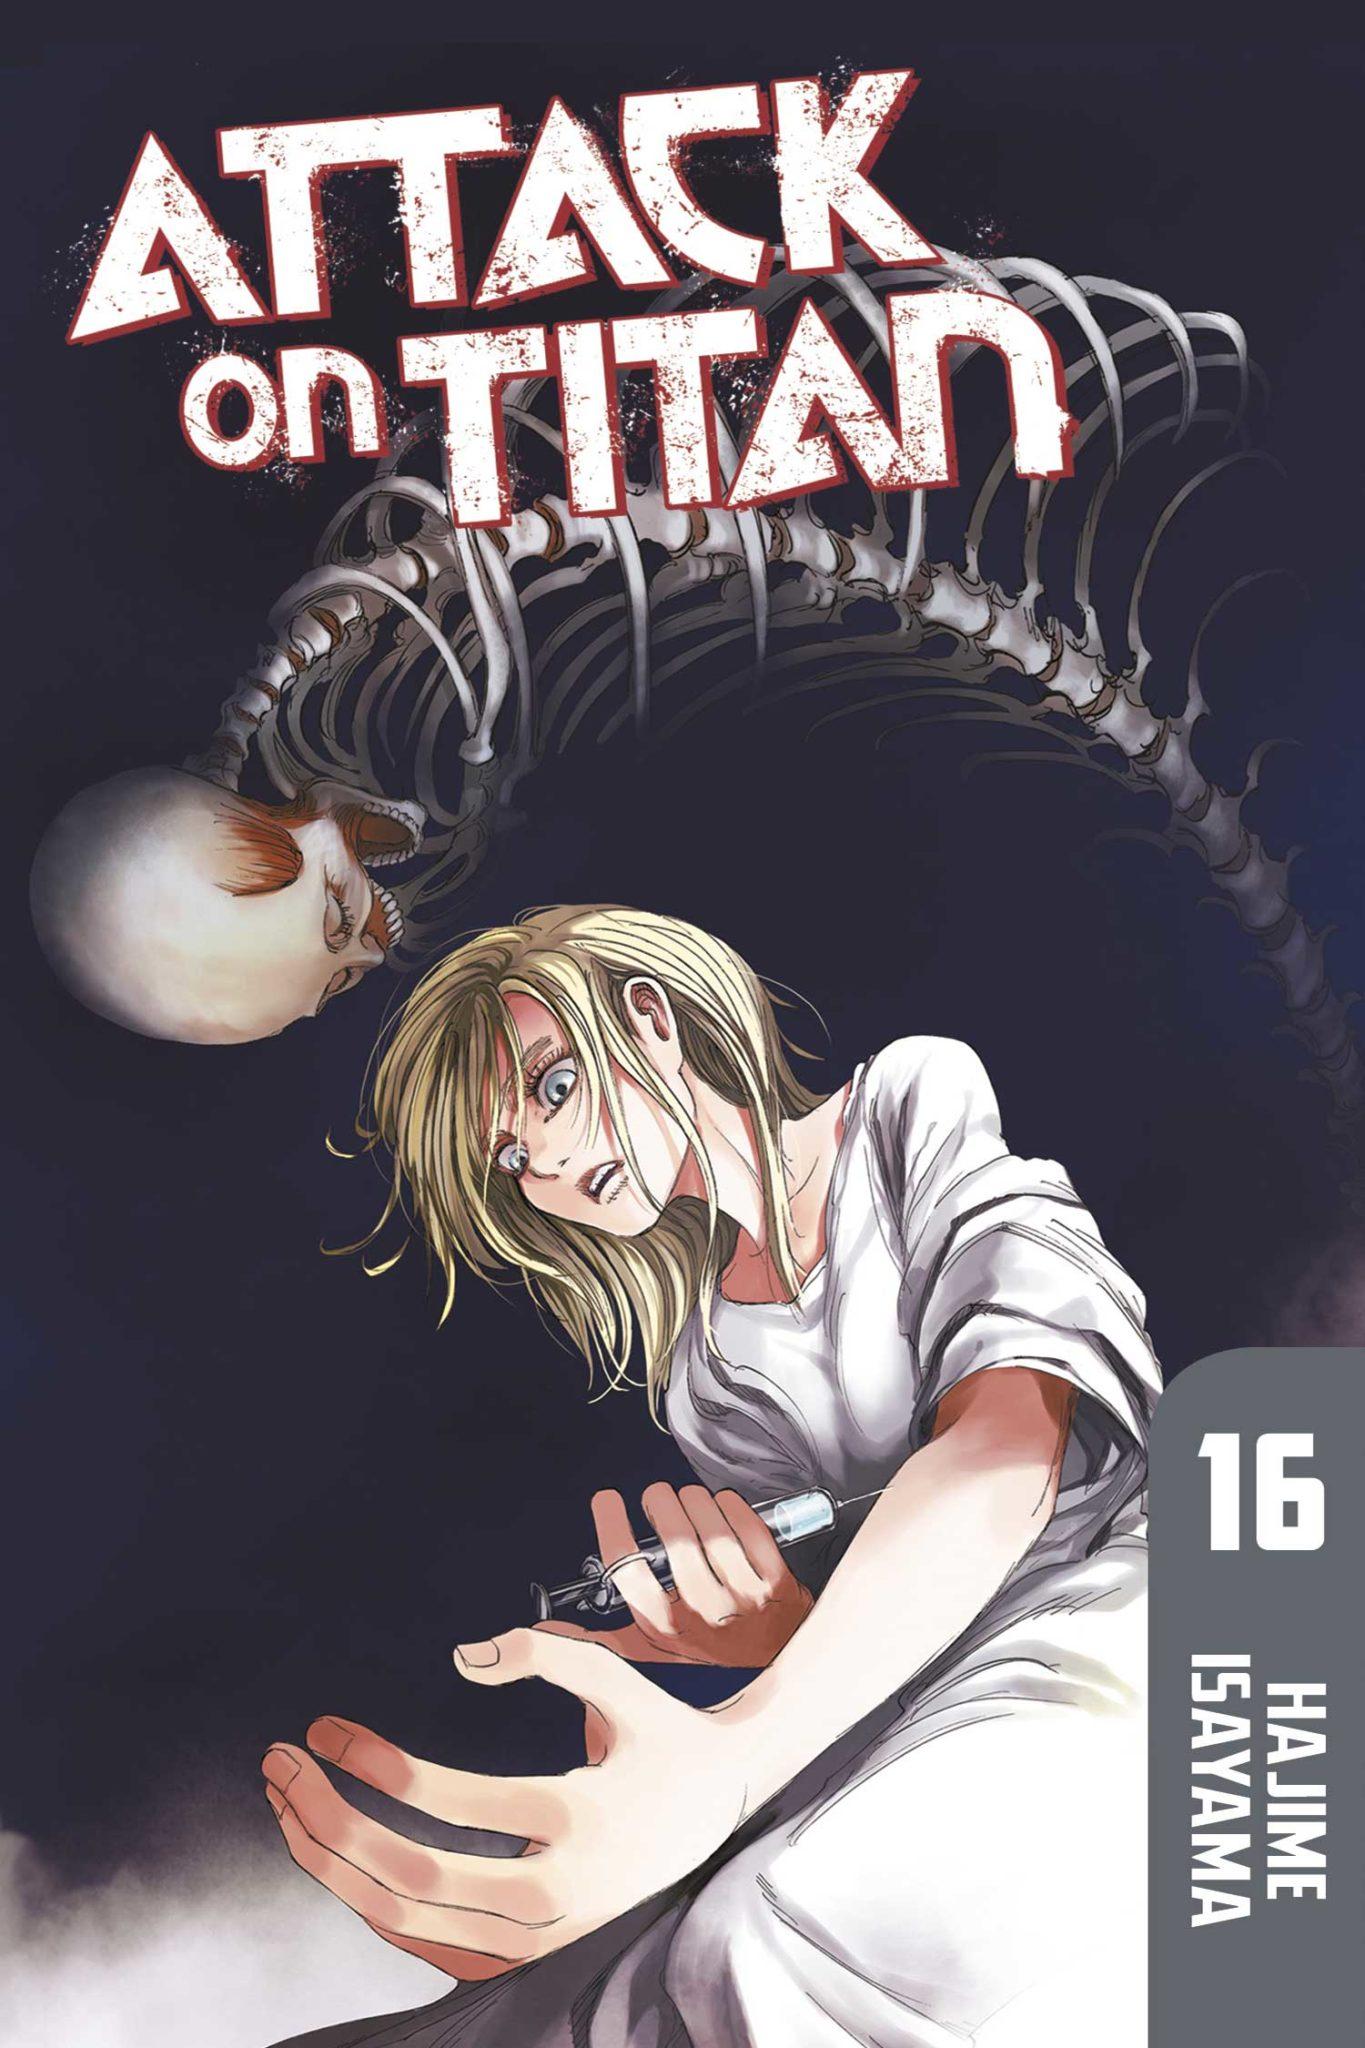 Attack on Titan, Volume 16 by Hajime Isayama